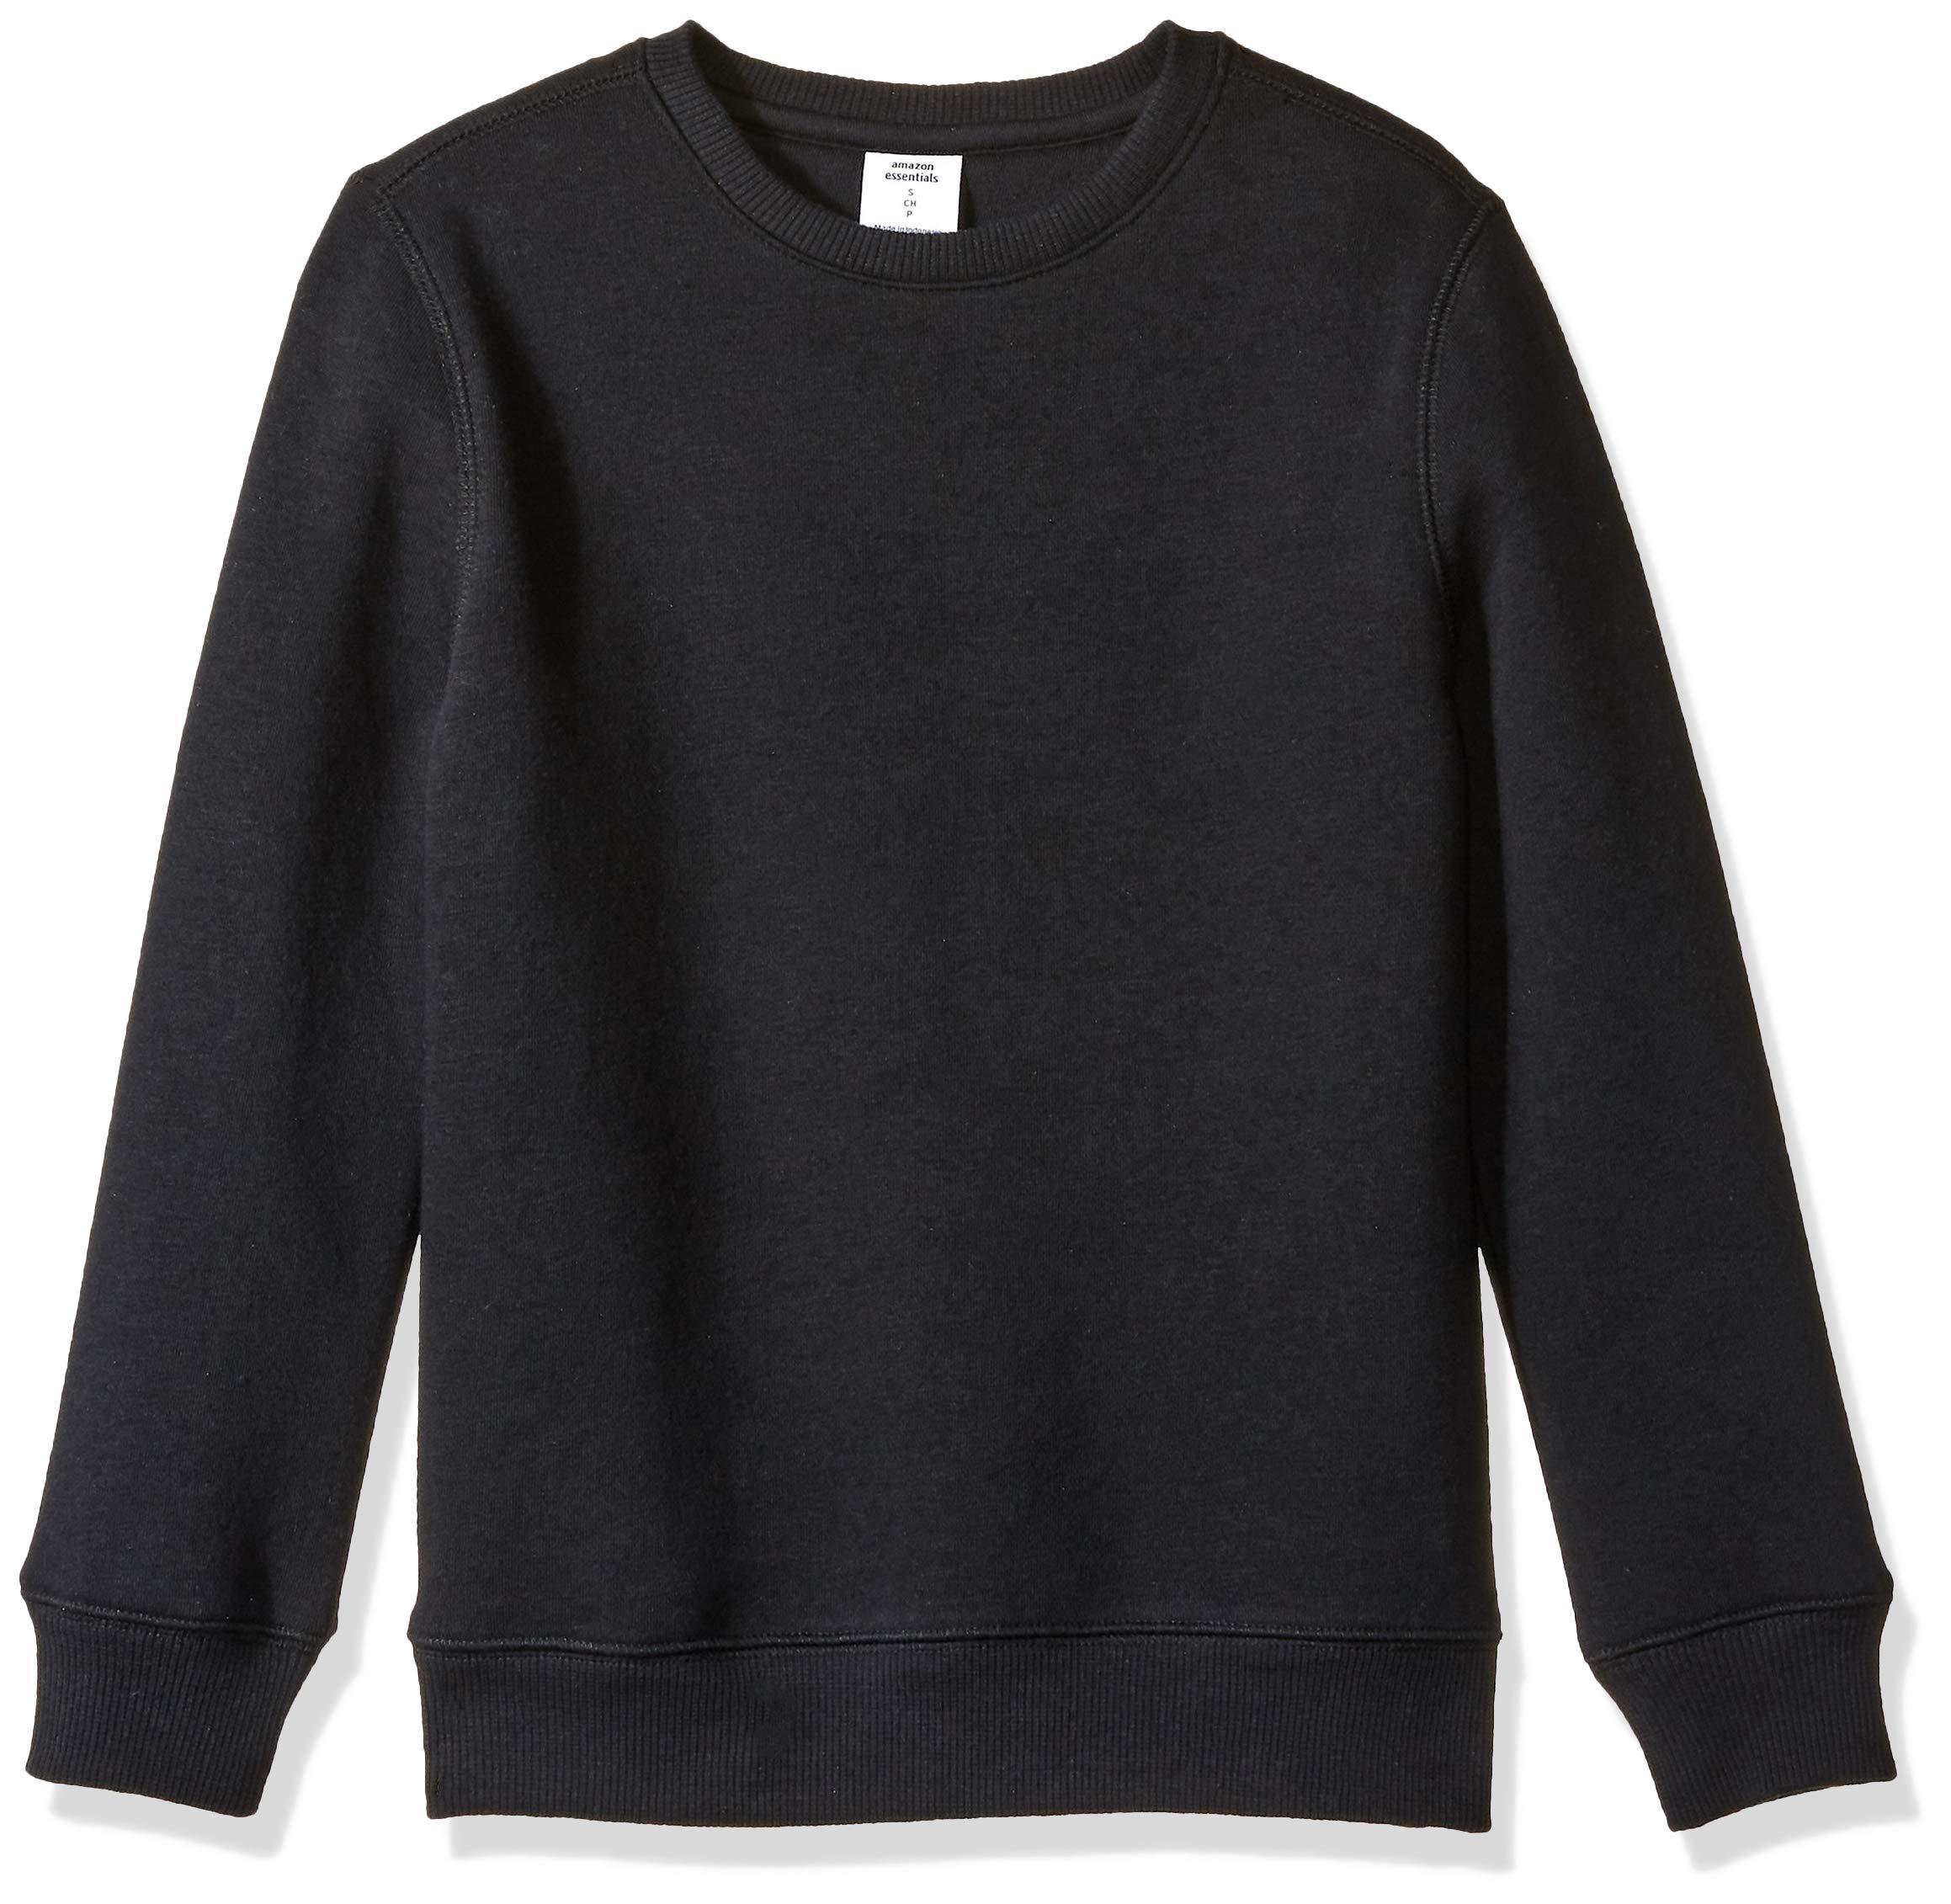 Amazon Essentials Boy's Big Crew Neck Sweatshirt